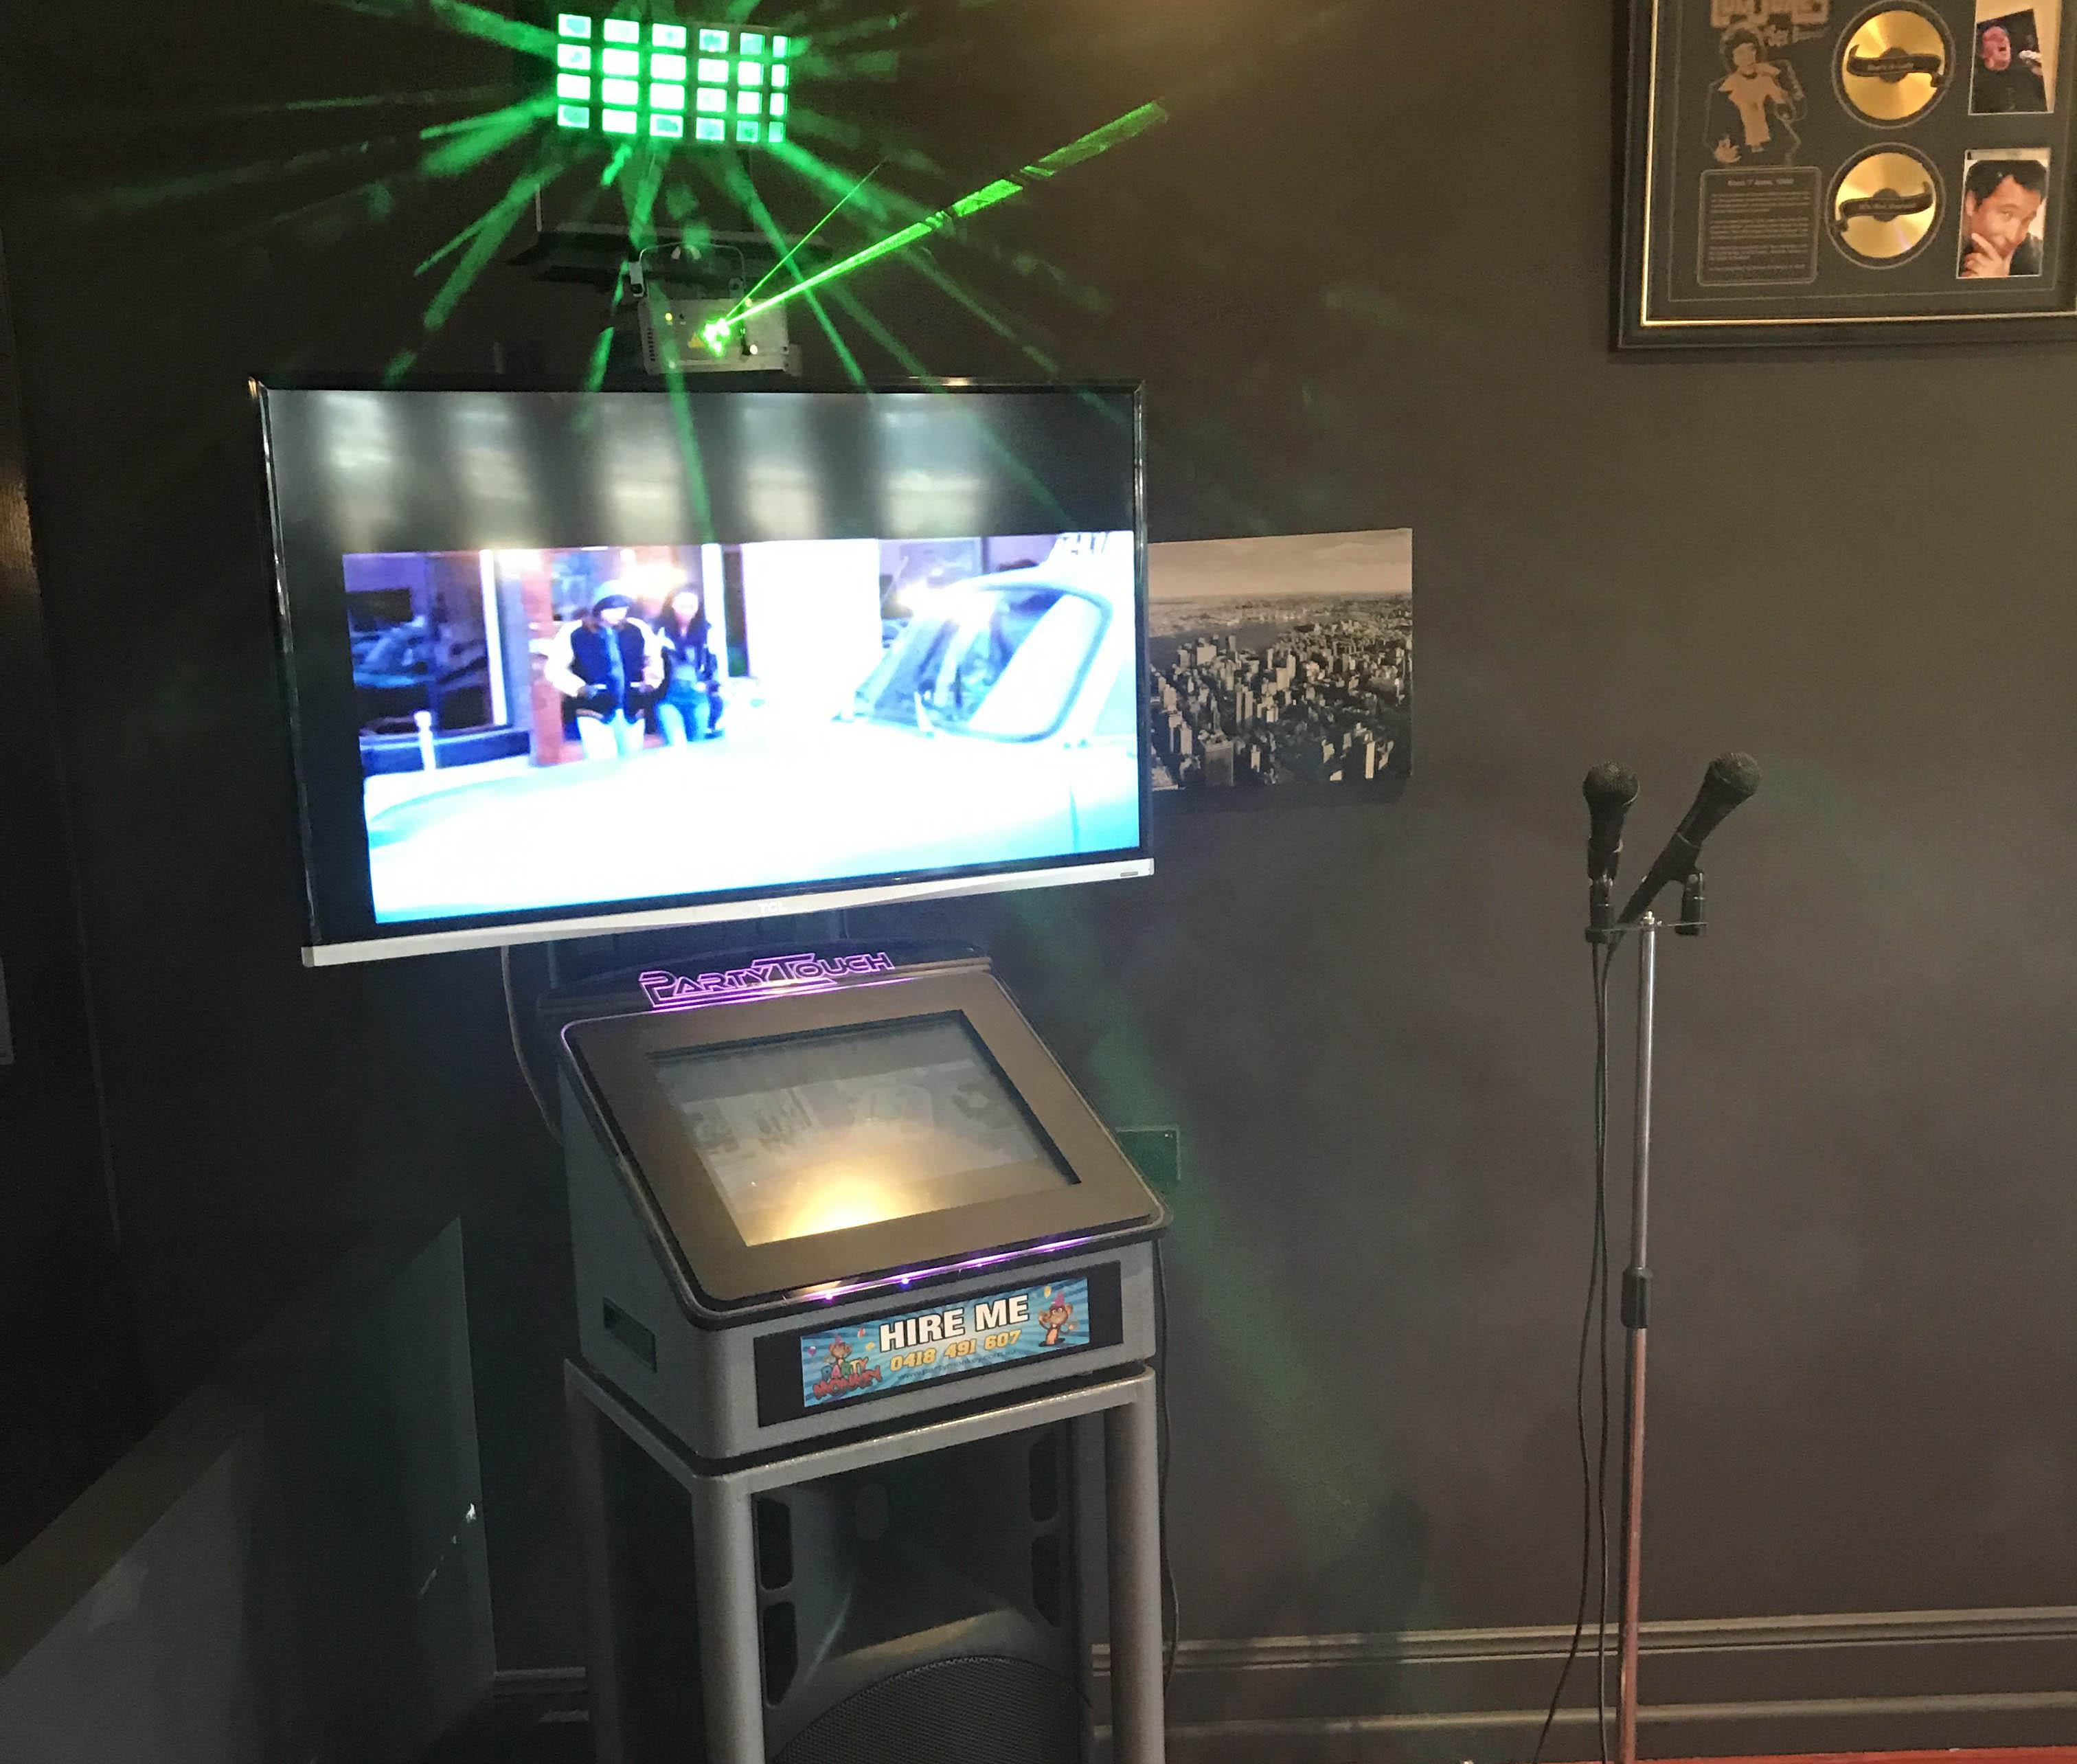 Jukebox/Karaoke Systems